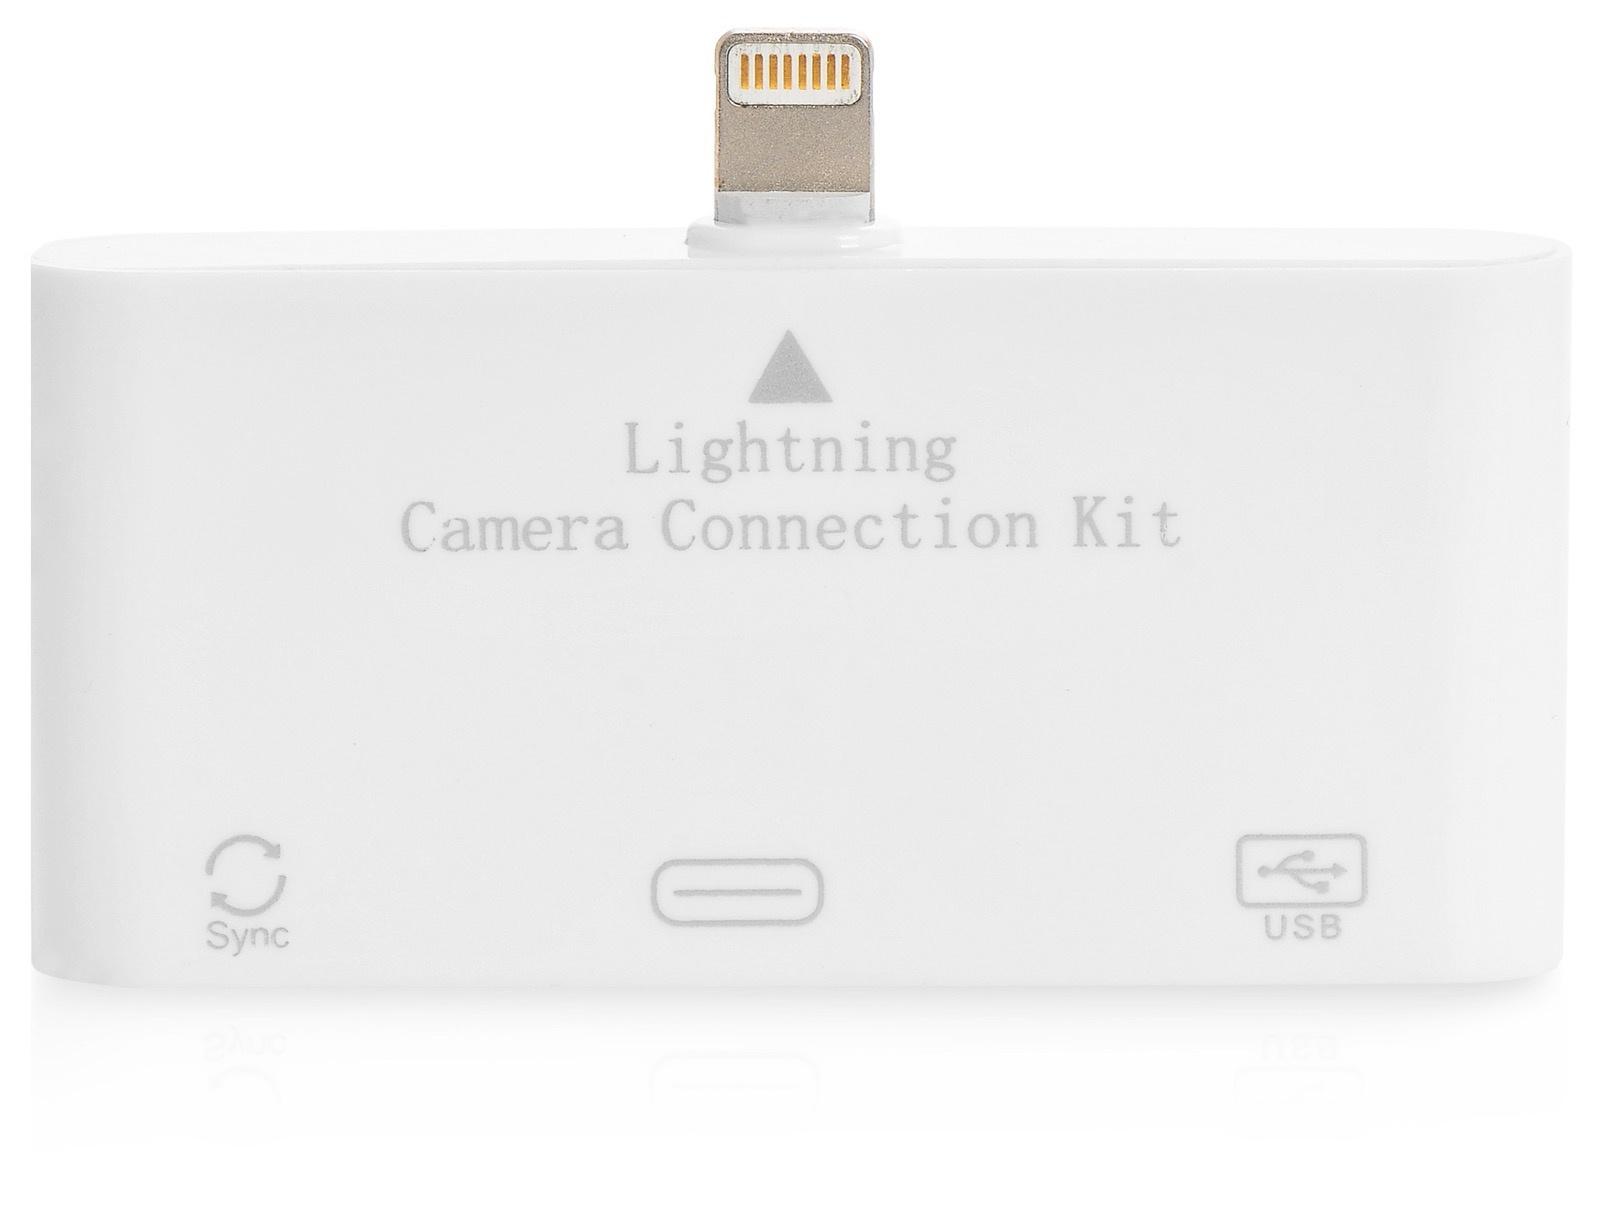 Адаптер переходник Gurdini Camera Connectoin For iPad4, iPad mini 3in1,110099,белый программа видеозаписи с веб камеры